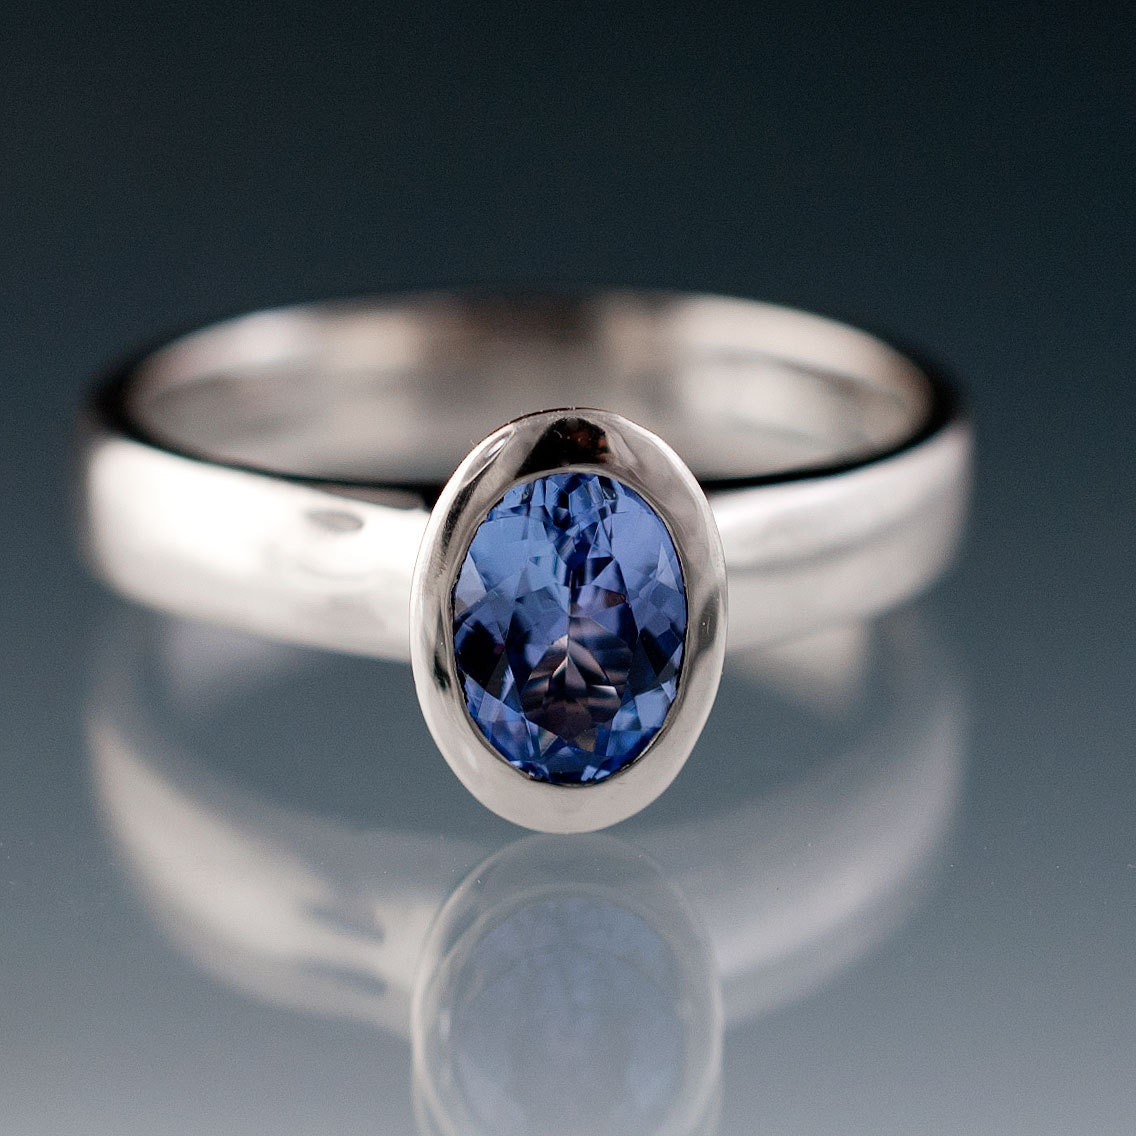 oval tanzanite bezel set ring uniue solitaire engagement ring. Black Bedroom Furniture Sets. Home Design Ideas